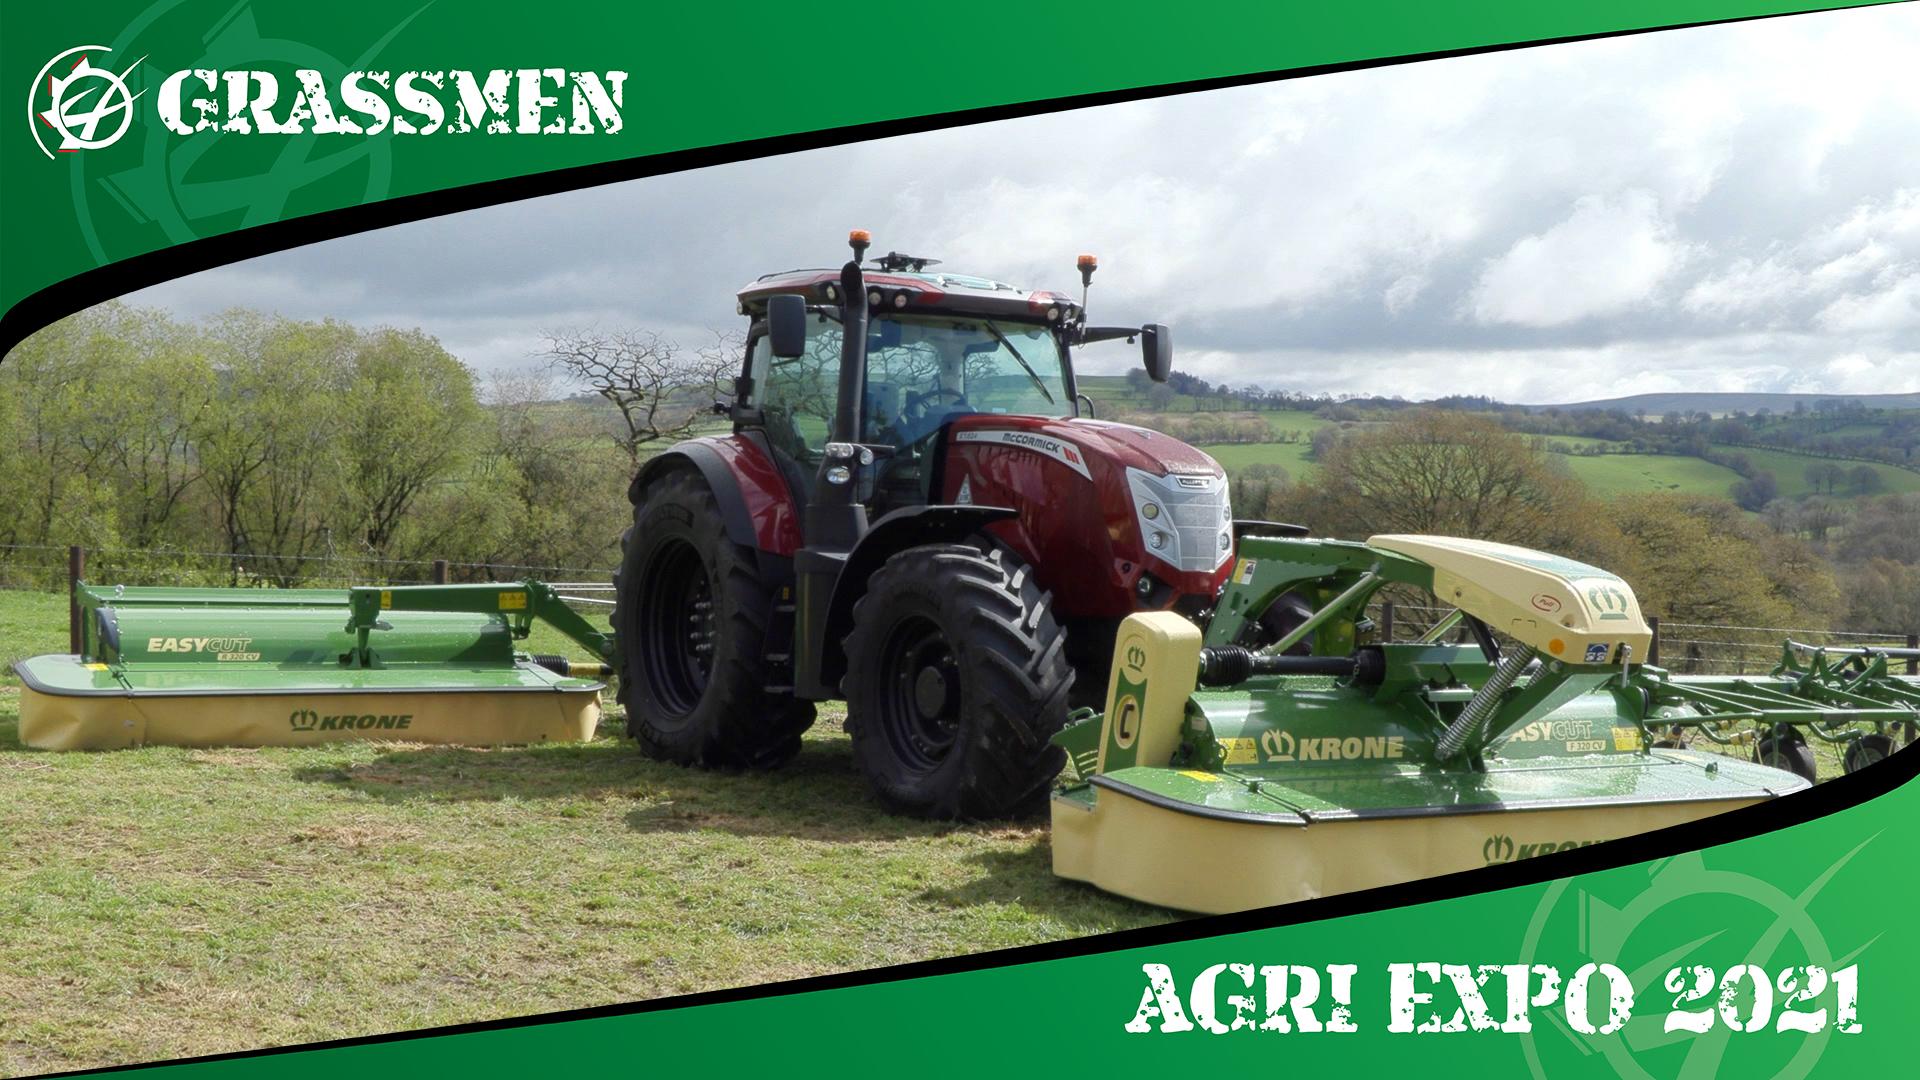 ARWEL'S AGRI SERVICES - GRASSMEN AGRI EXPO DAY 1